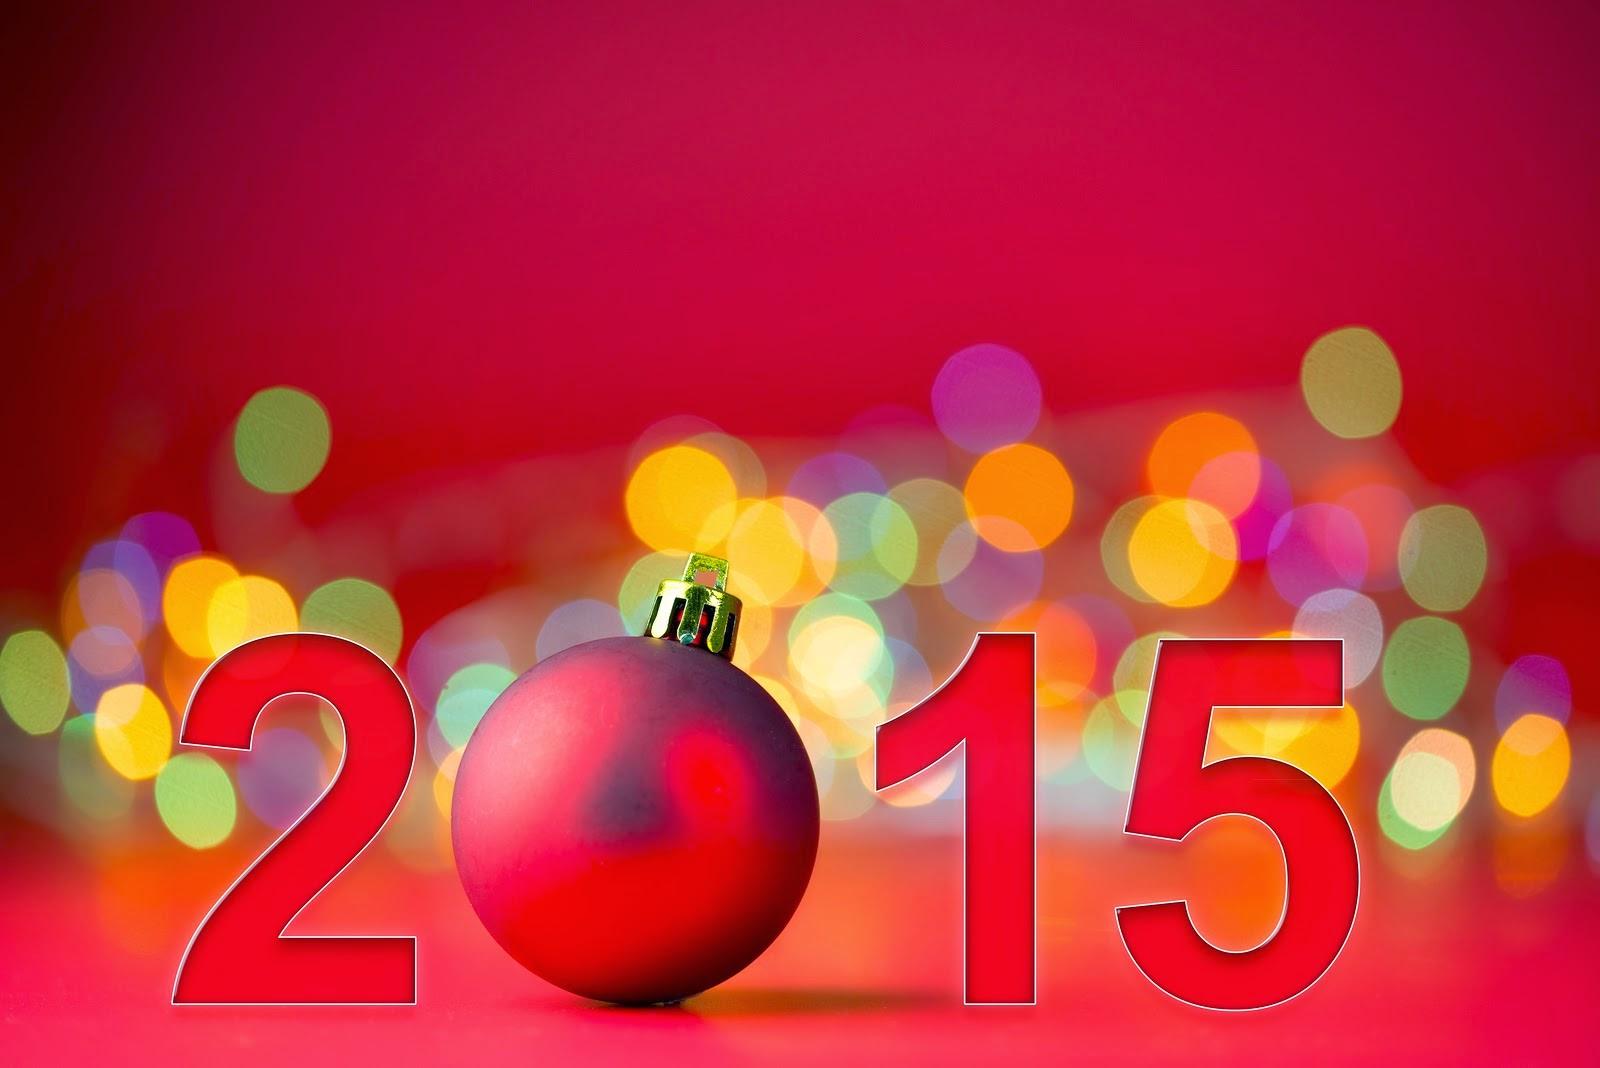 Leuke Nieuwjaarswensen 2015 | Search Results | Calendar 2015